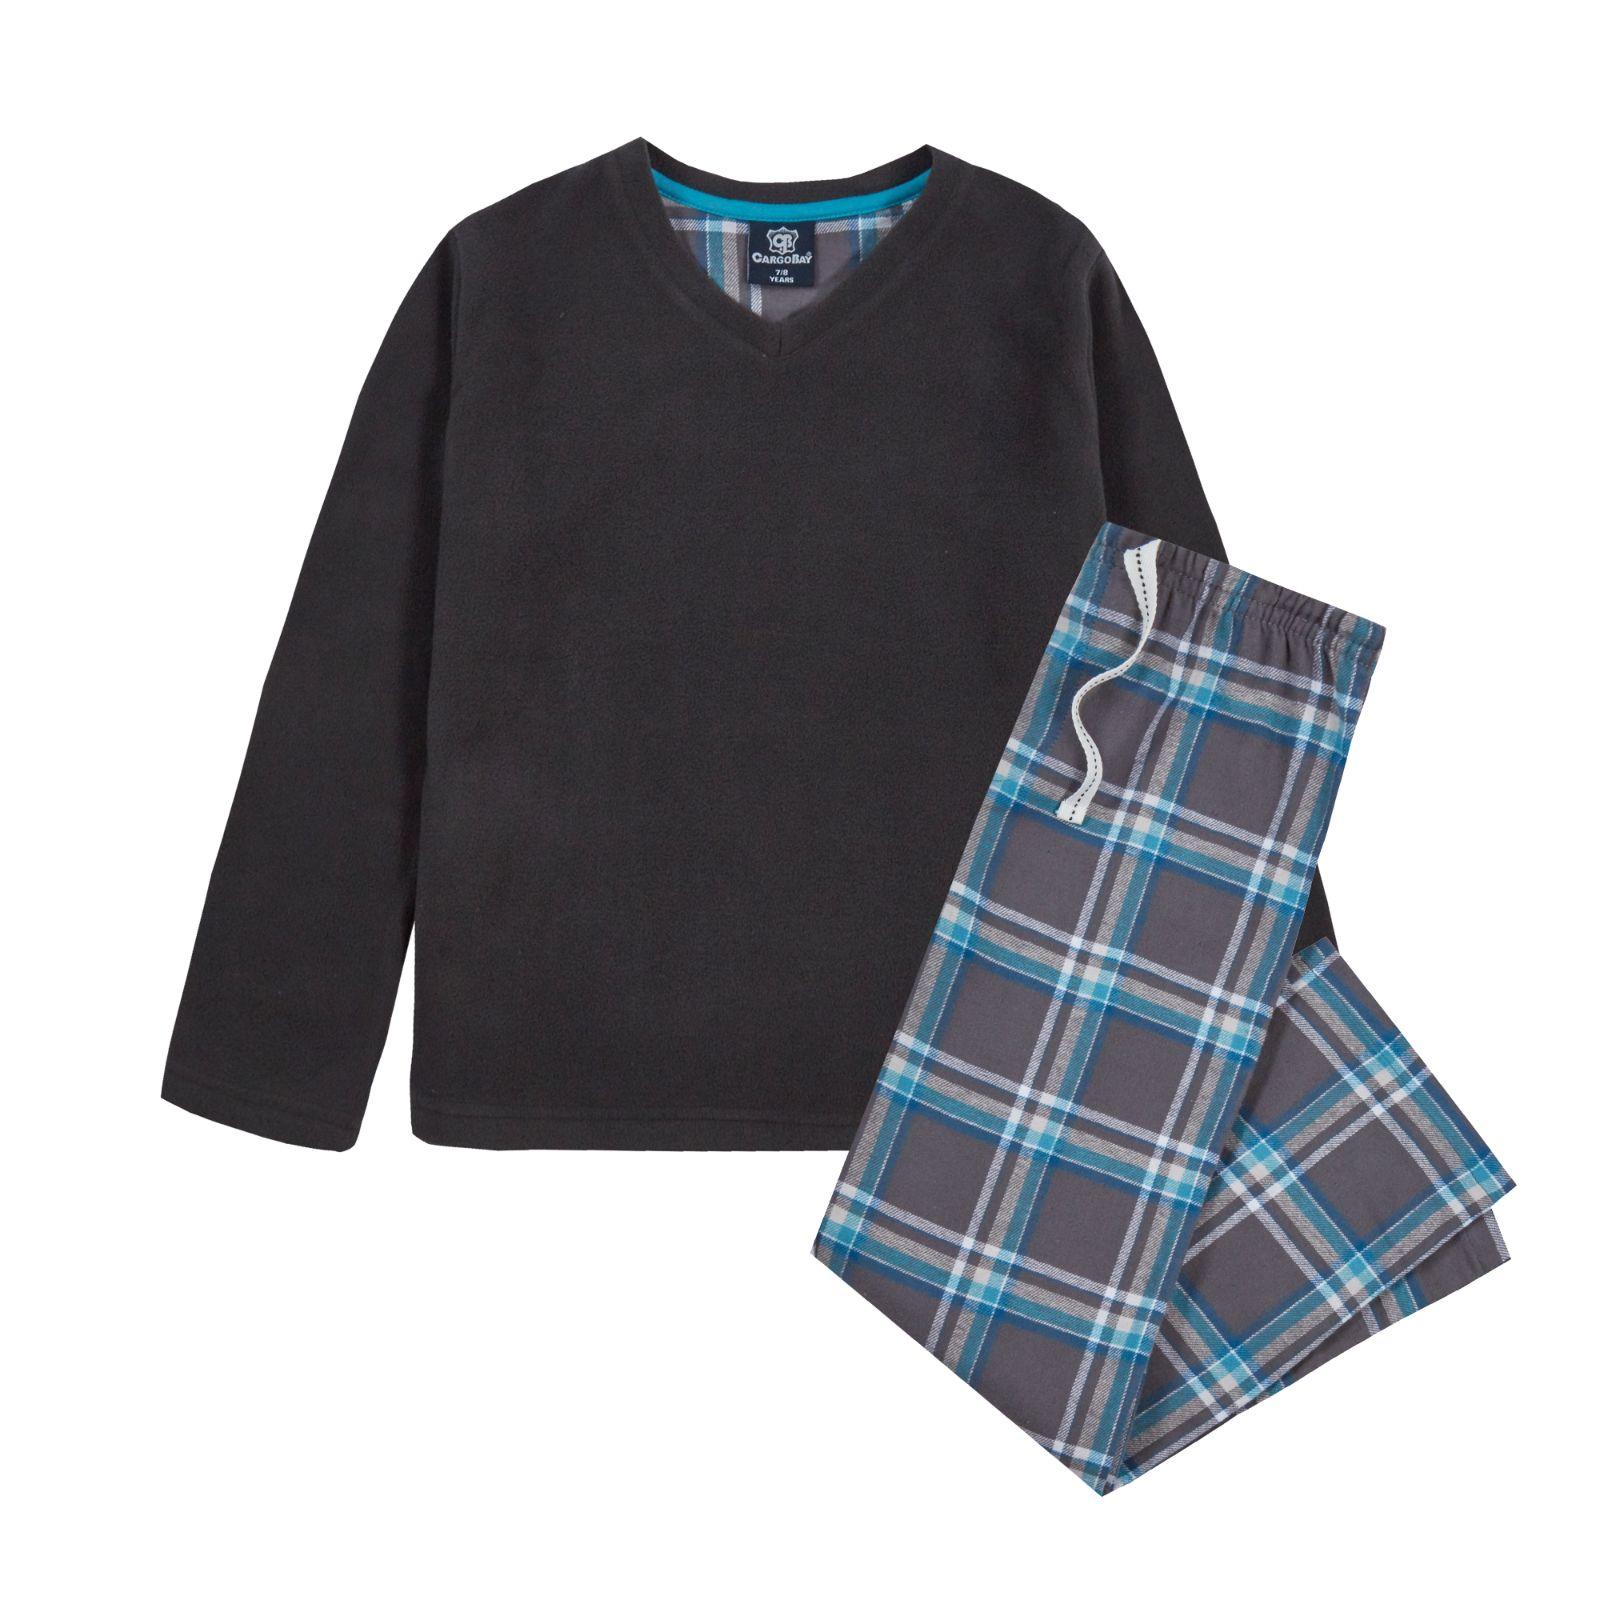 7-8 9-10 /& 11-12 ans Neuf Garçons Star Wars Pyjamas Set taille 5-6